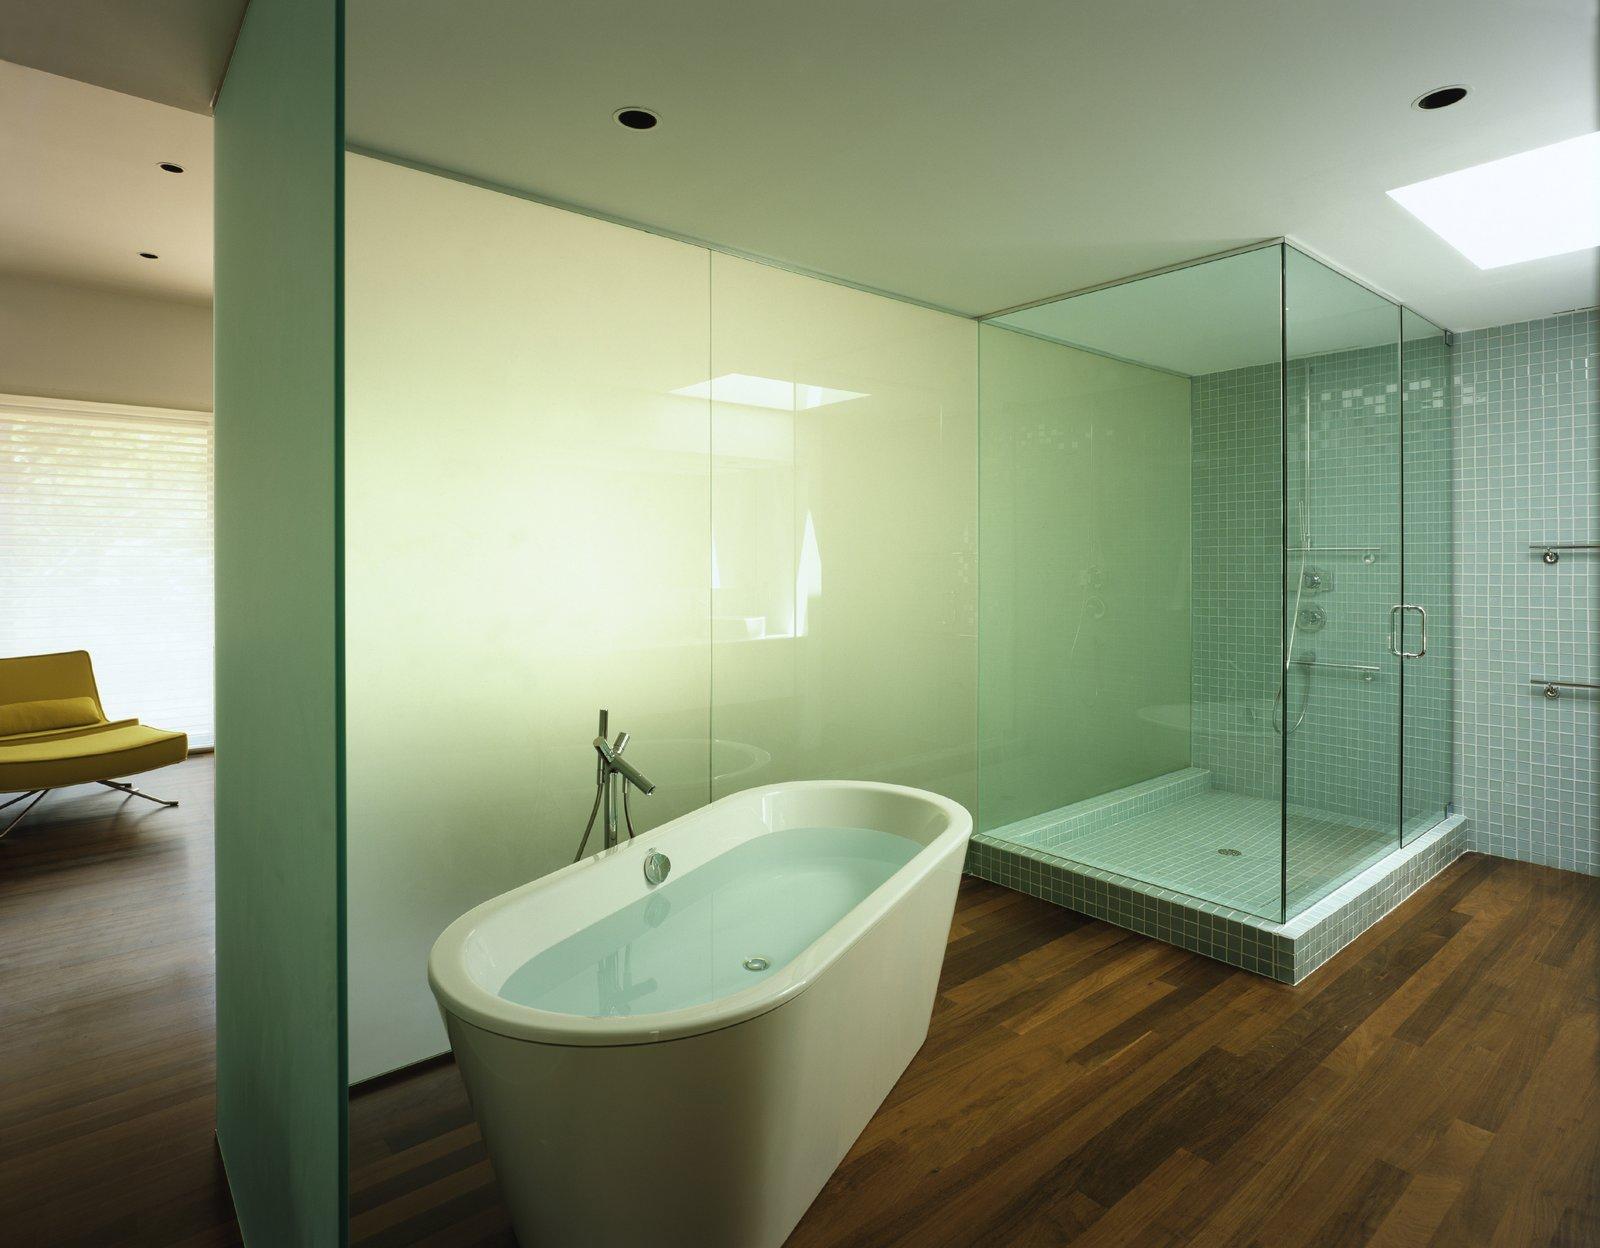 Bath Room, Soaking Tub, Medium Hardwood Floor, Freestanding Tub, Enclosed Shower, Glass Tile Wall, Corner Shower, and Recessed Lighting  Sagaponac House by Hariri & Hariri Architecture